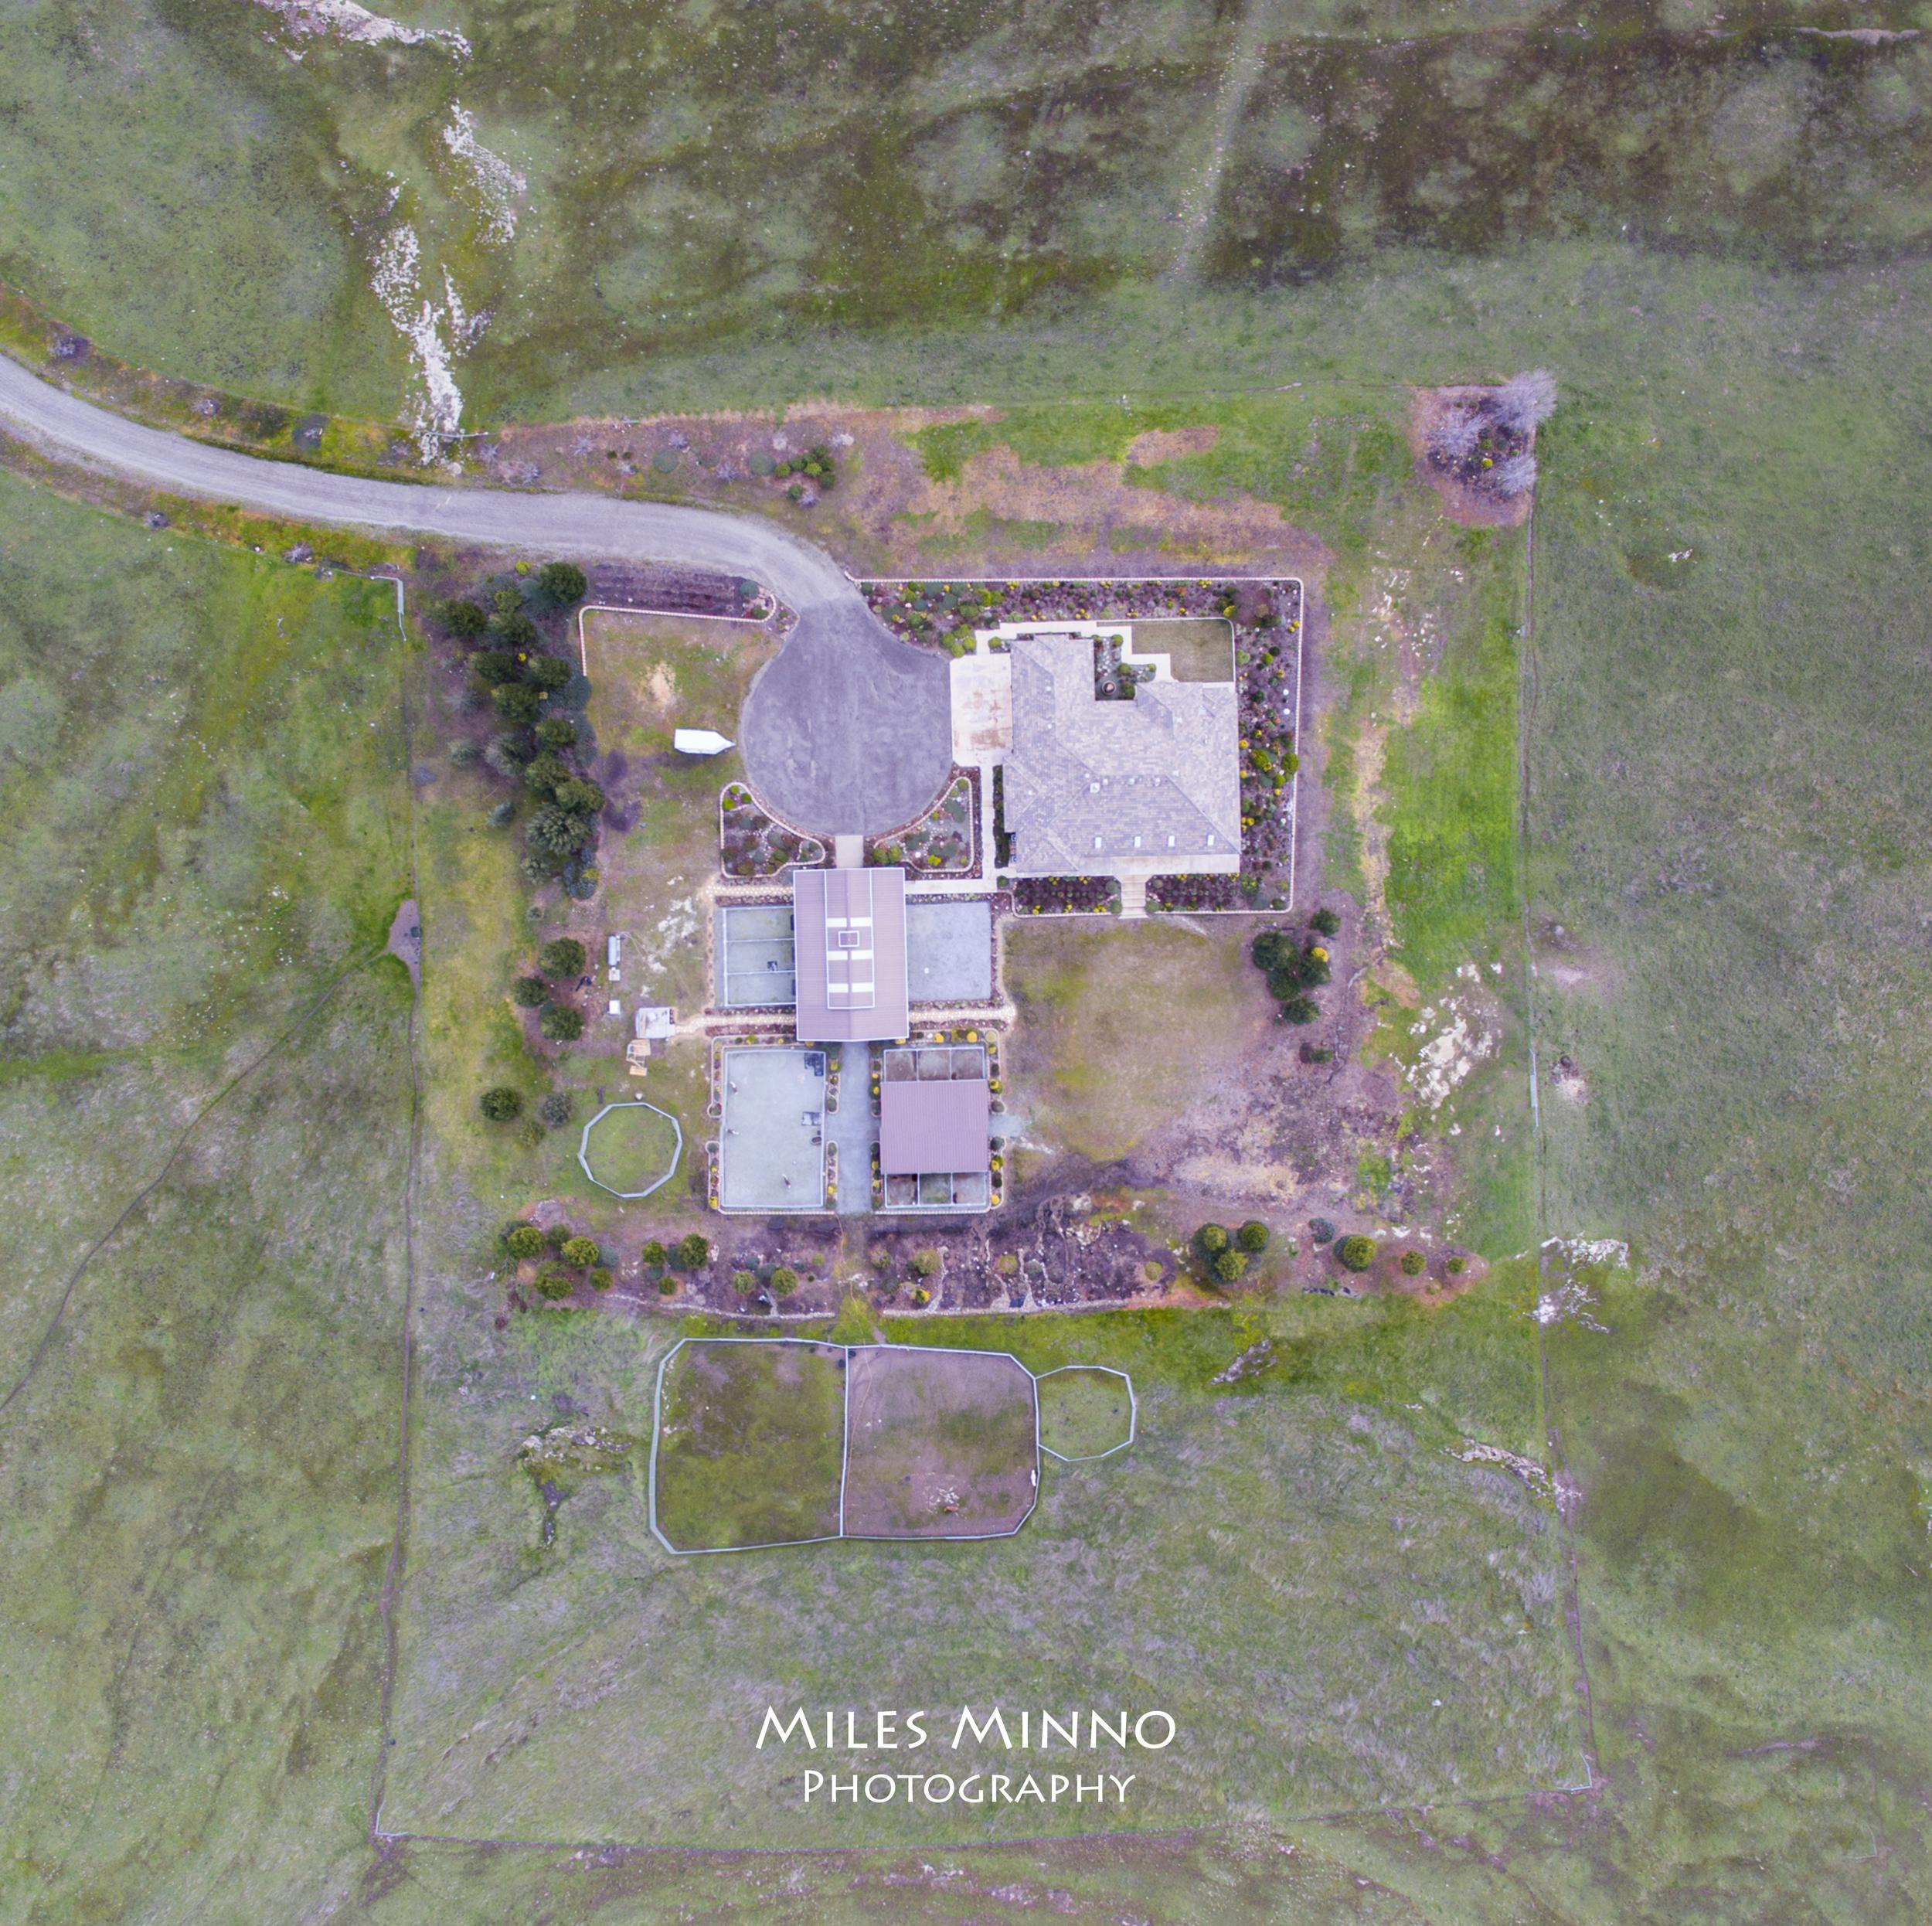 Drone_OverHaed_Panorama_Milesminnojpg